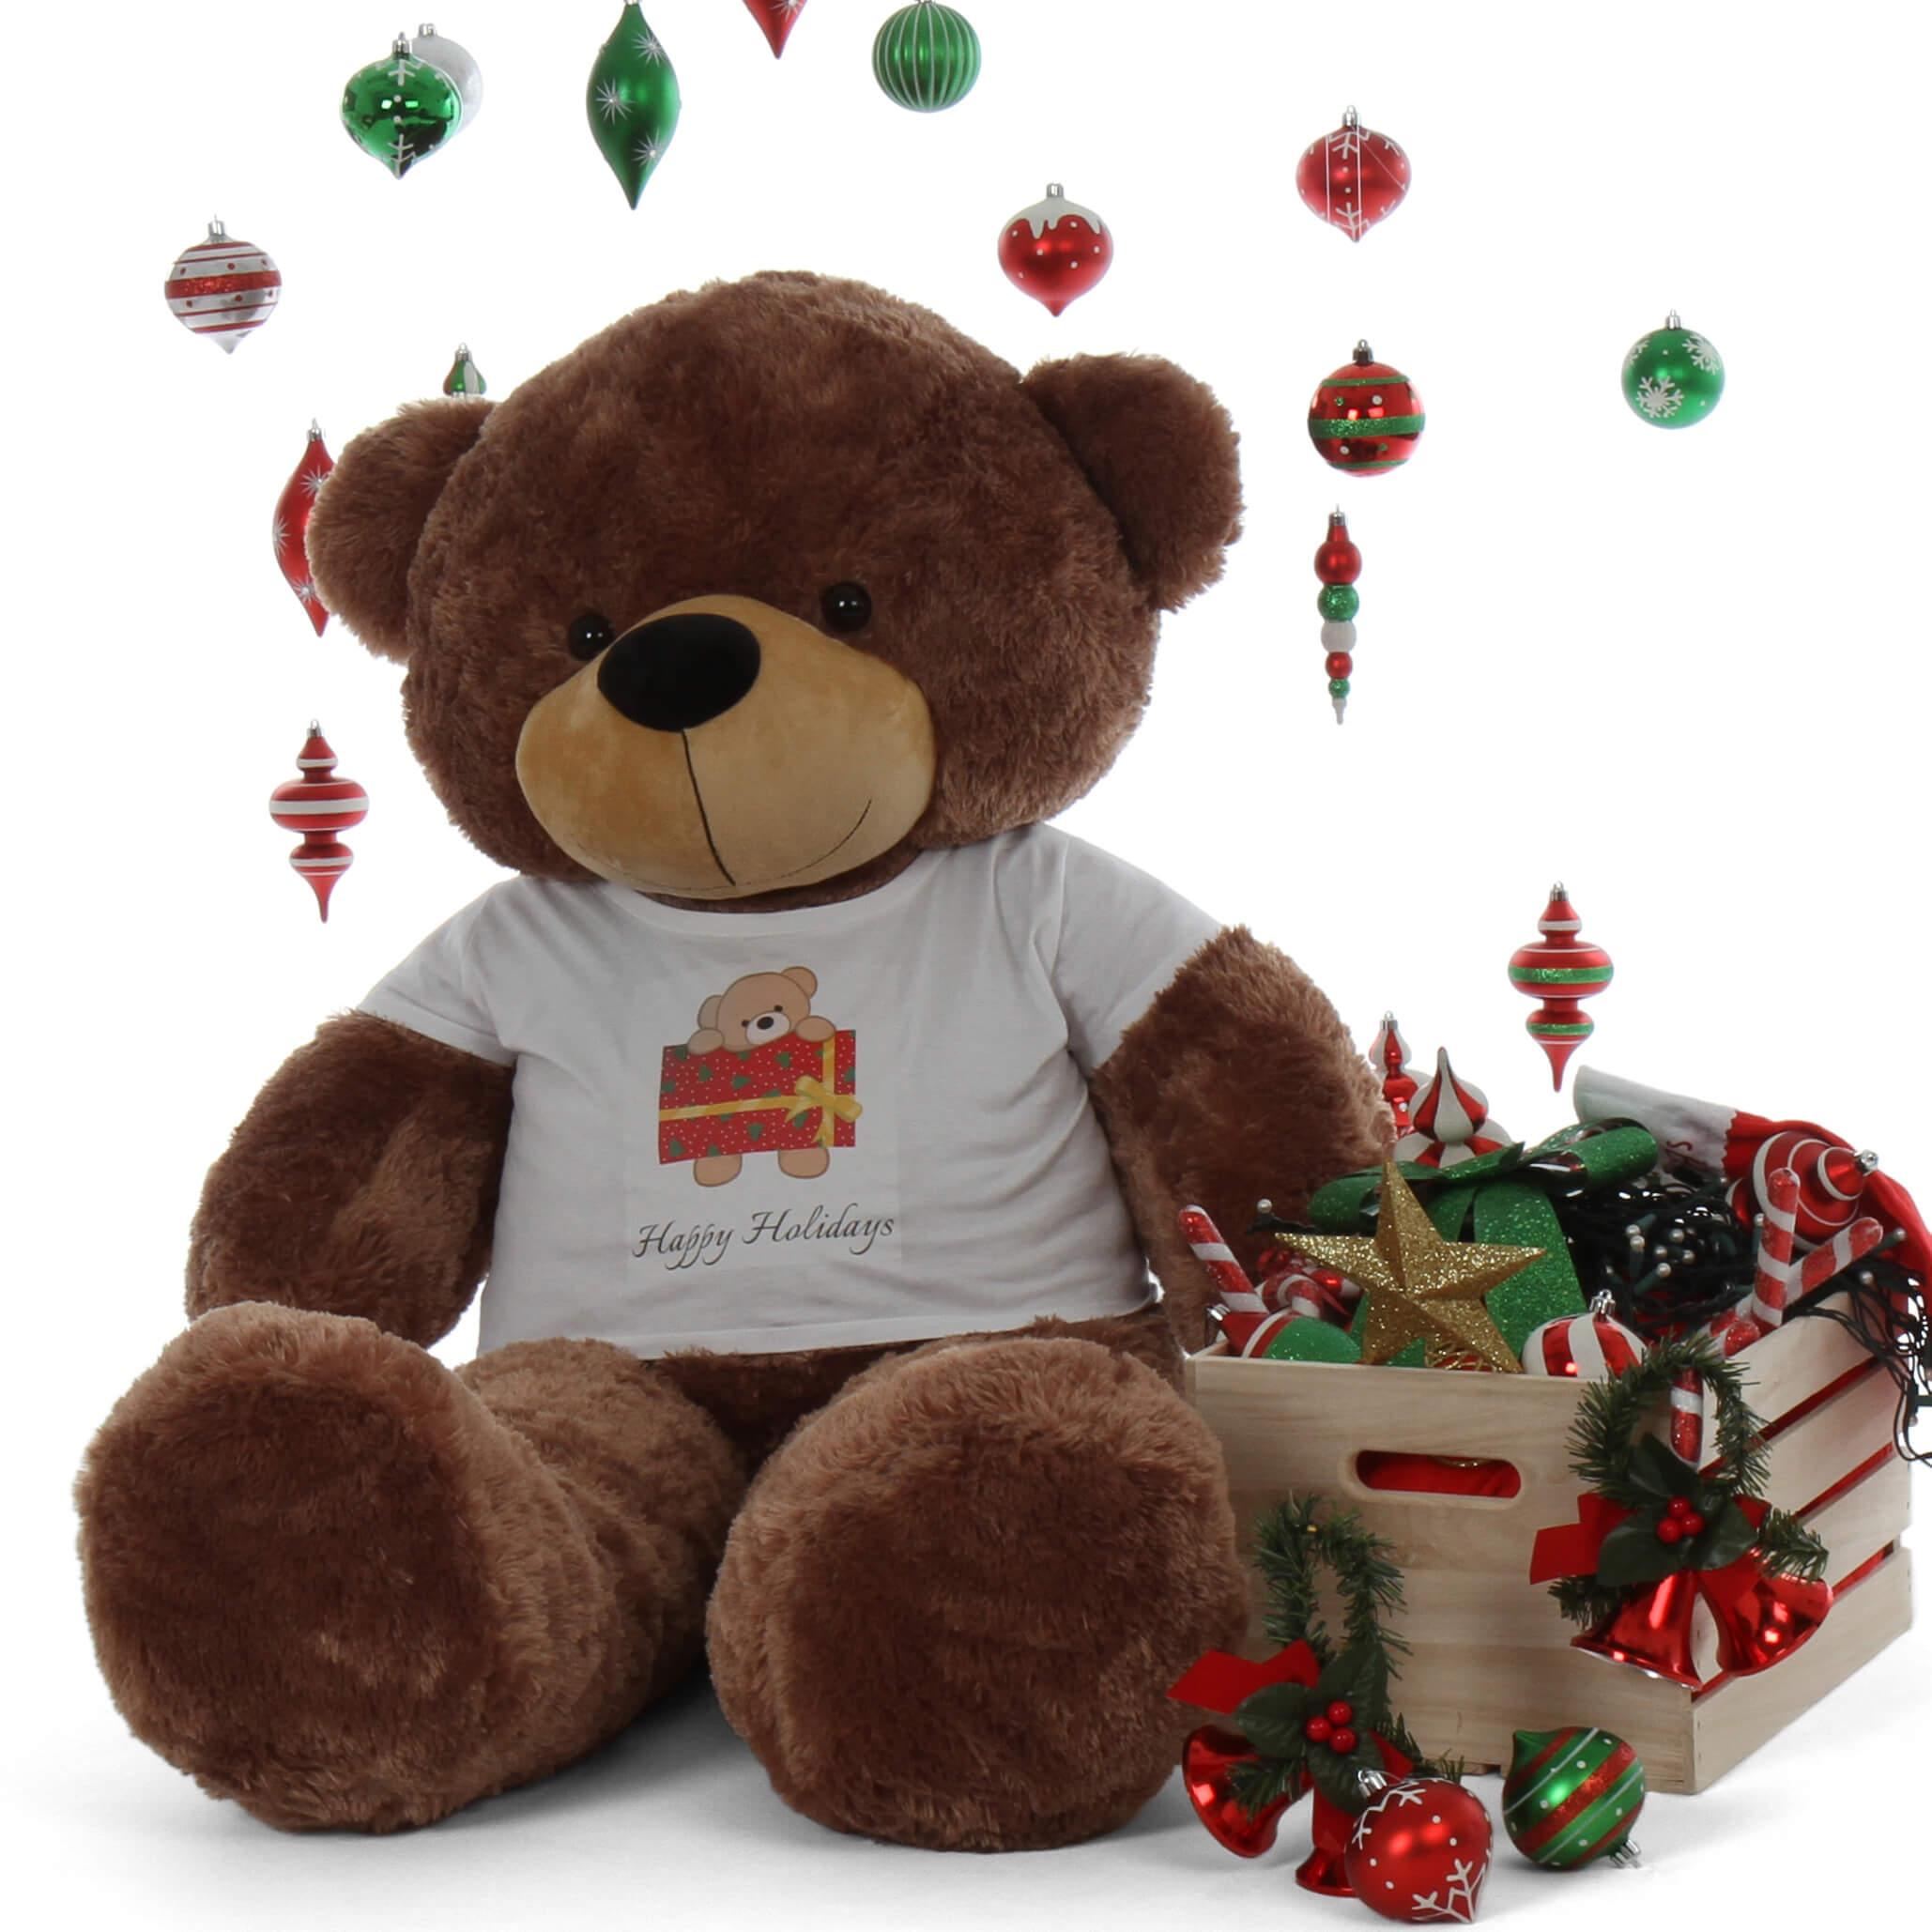 116005-hh-gift-2-a-.jpg